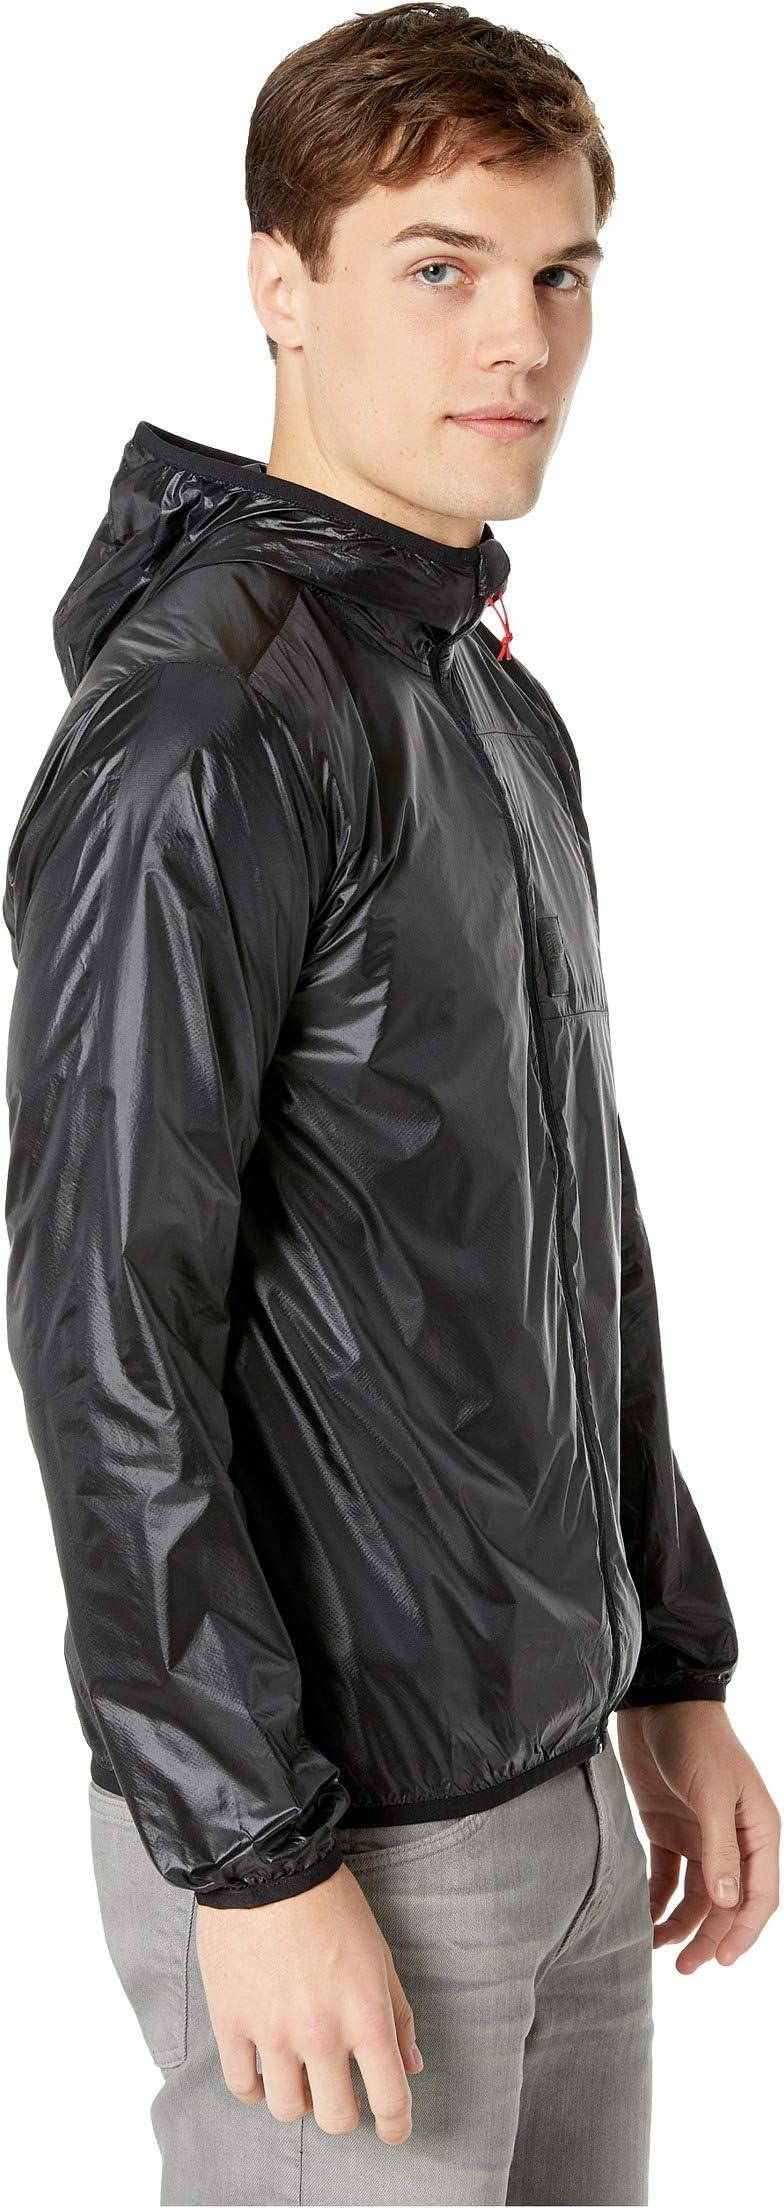 Topo Designs Ultralight Jacket 4kQaW